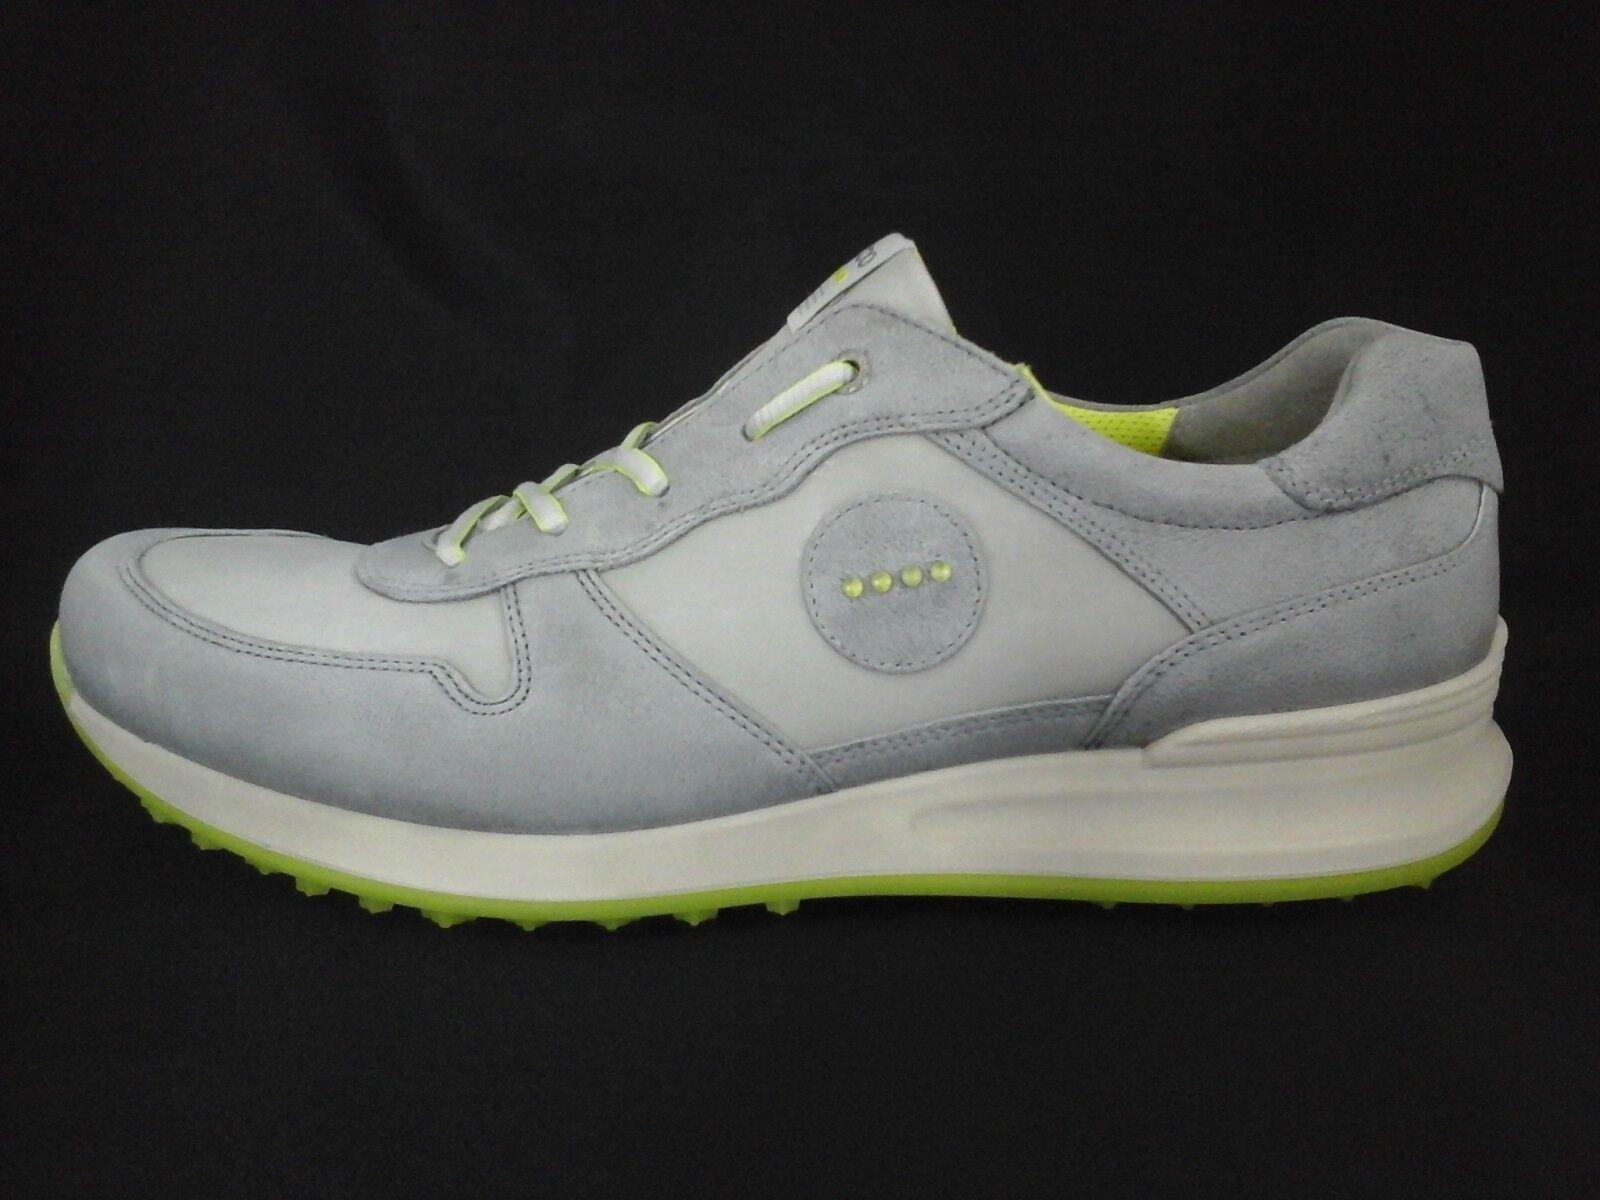 Ecco Golf Shoes Speed Hybrid Titanium/Wild Dove Leather Mens US 13/13.5/47 180